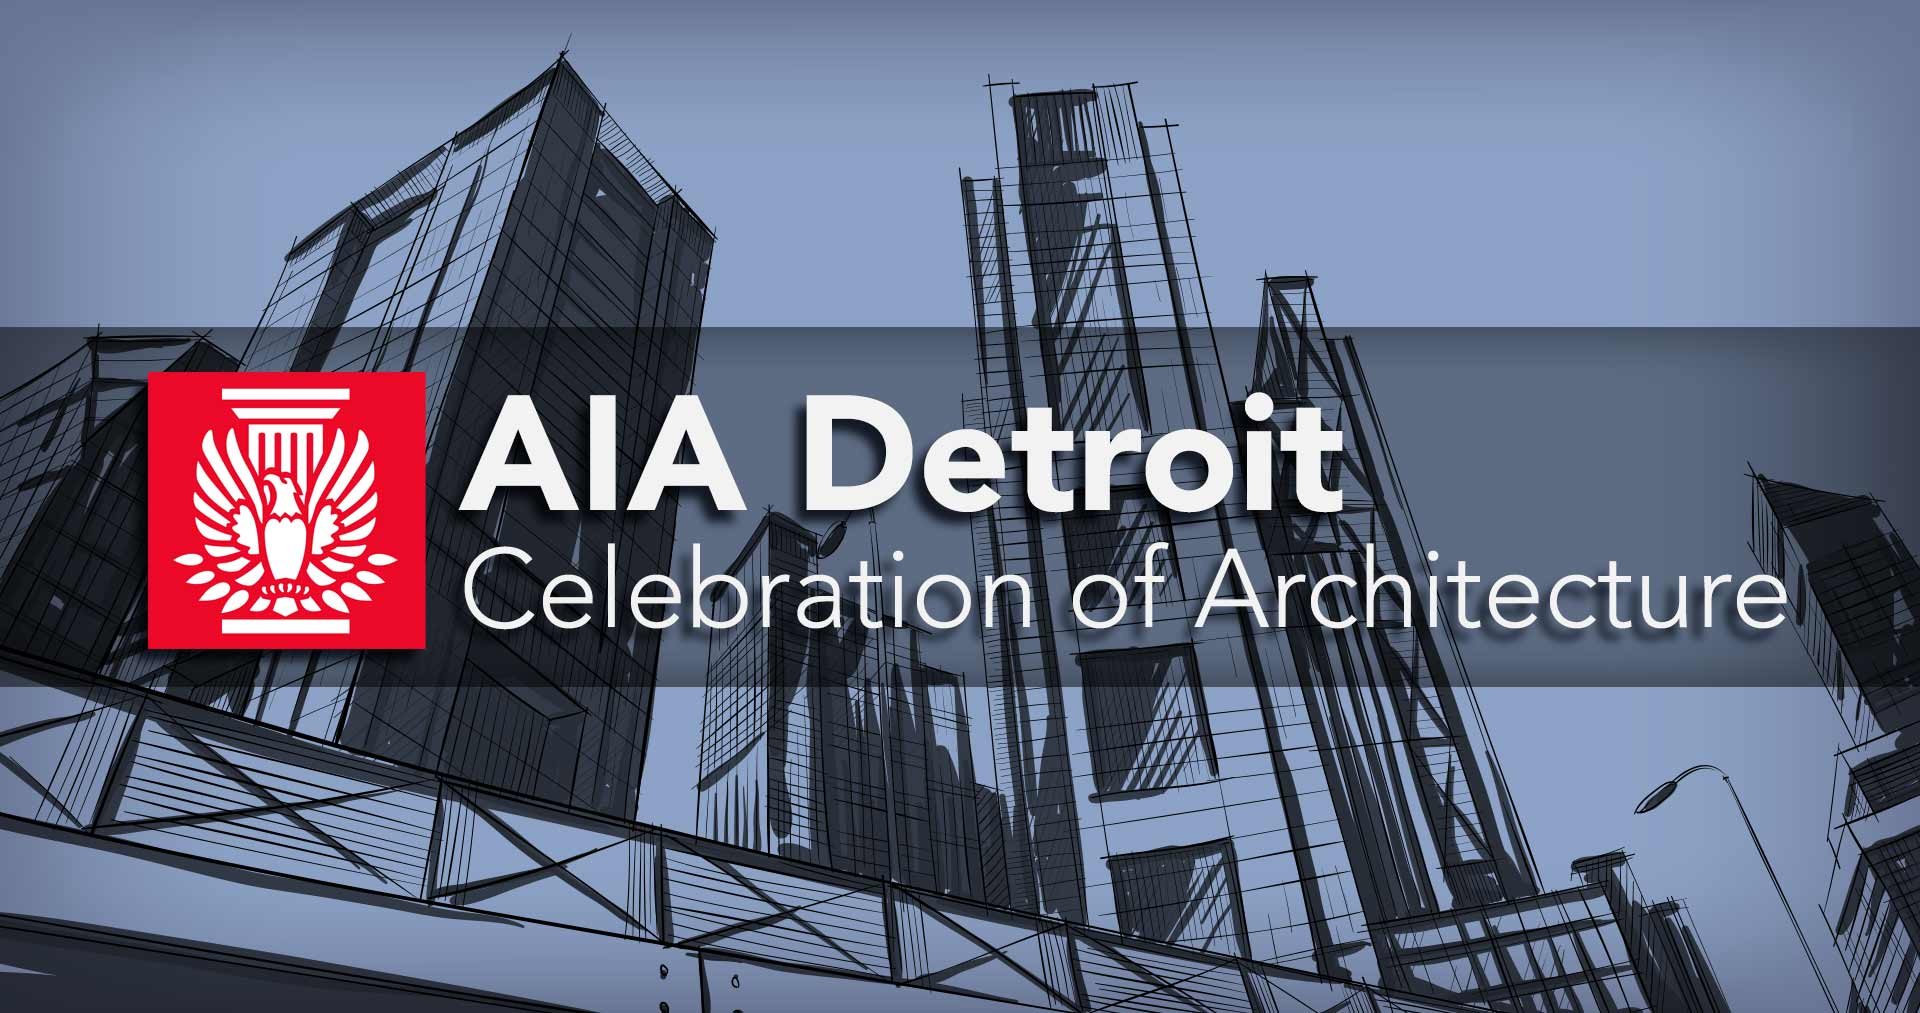 NBS AIA Detroit Celebration of Architecture